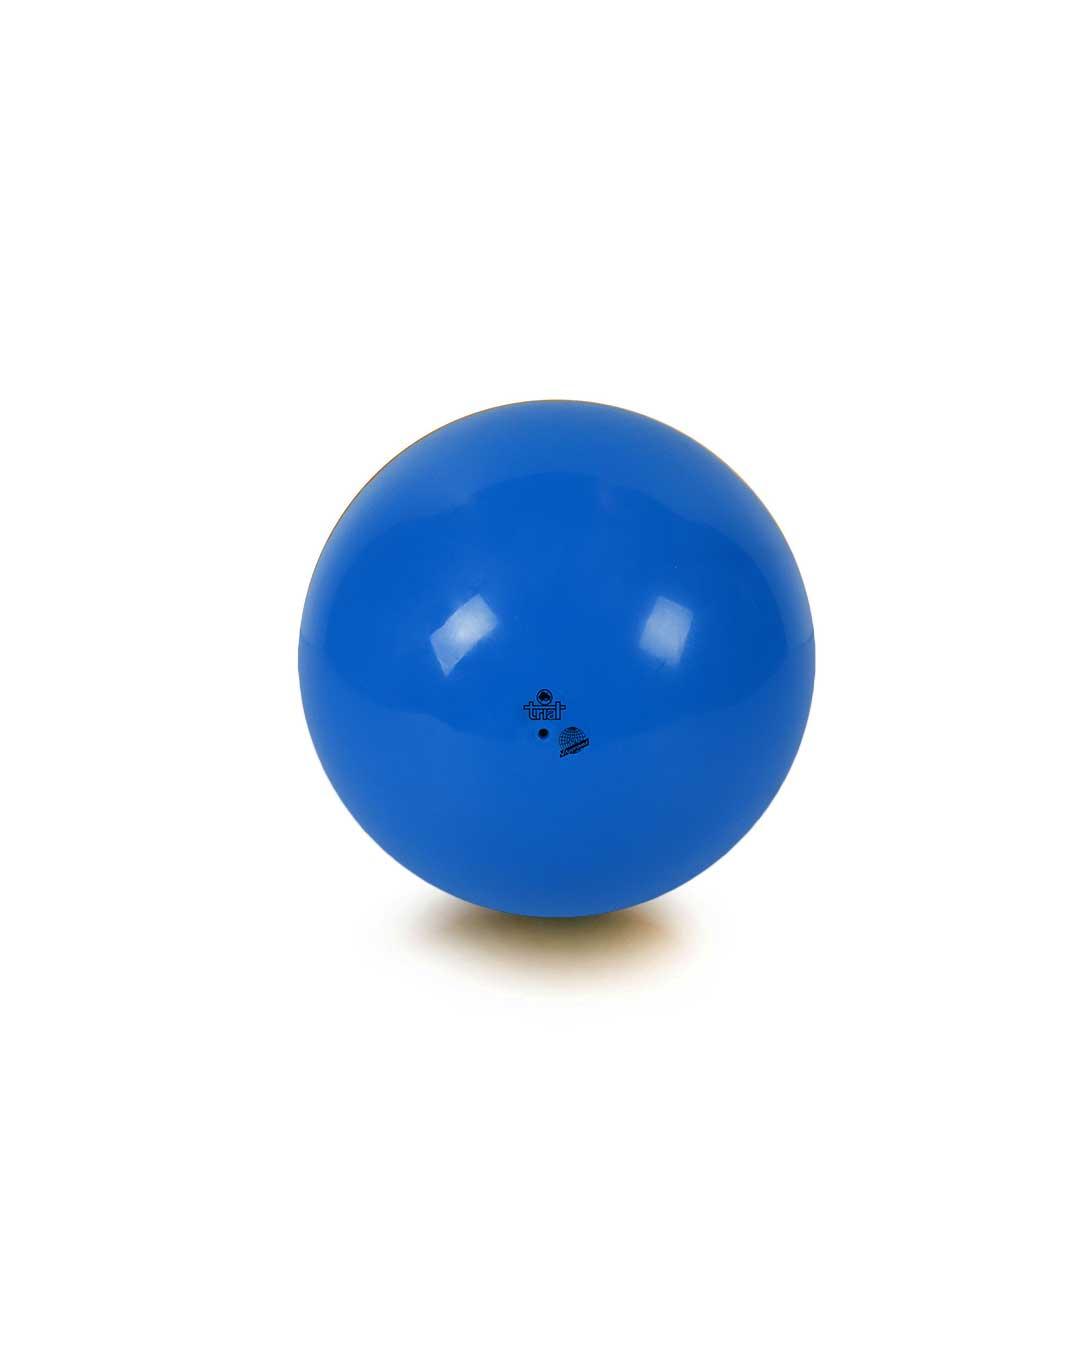 Balón de gimnasia rítmica – Marca Trial color azul 19 cm (certificado FIG)